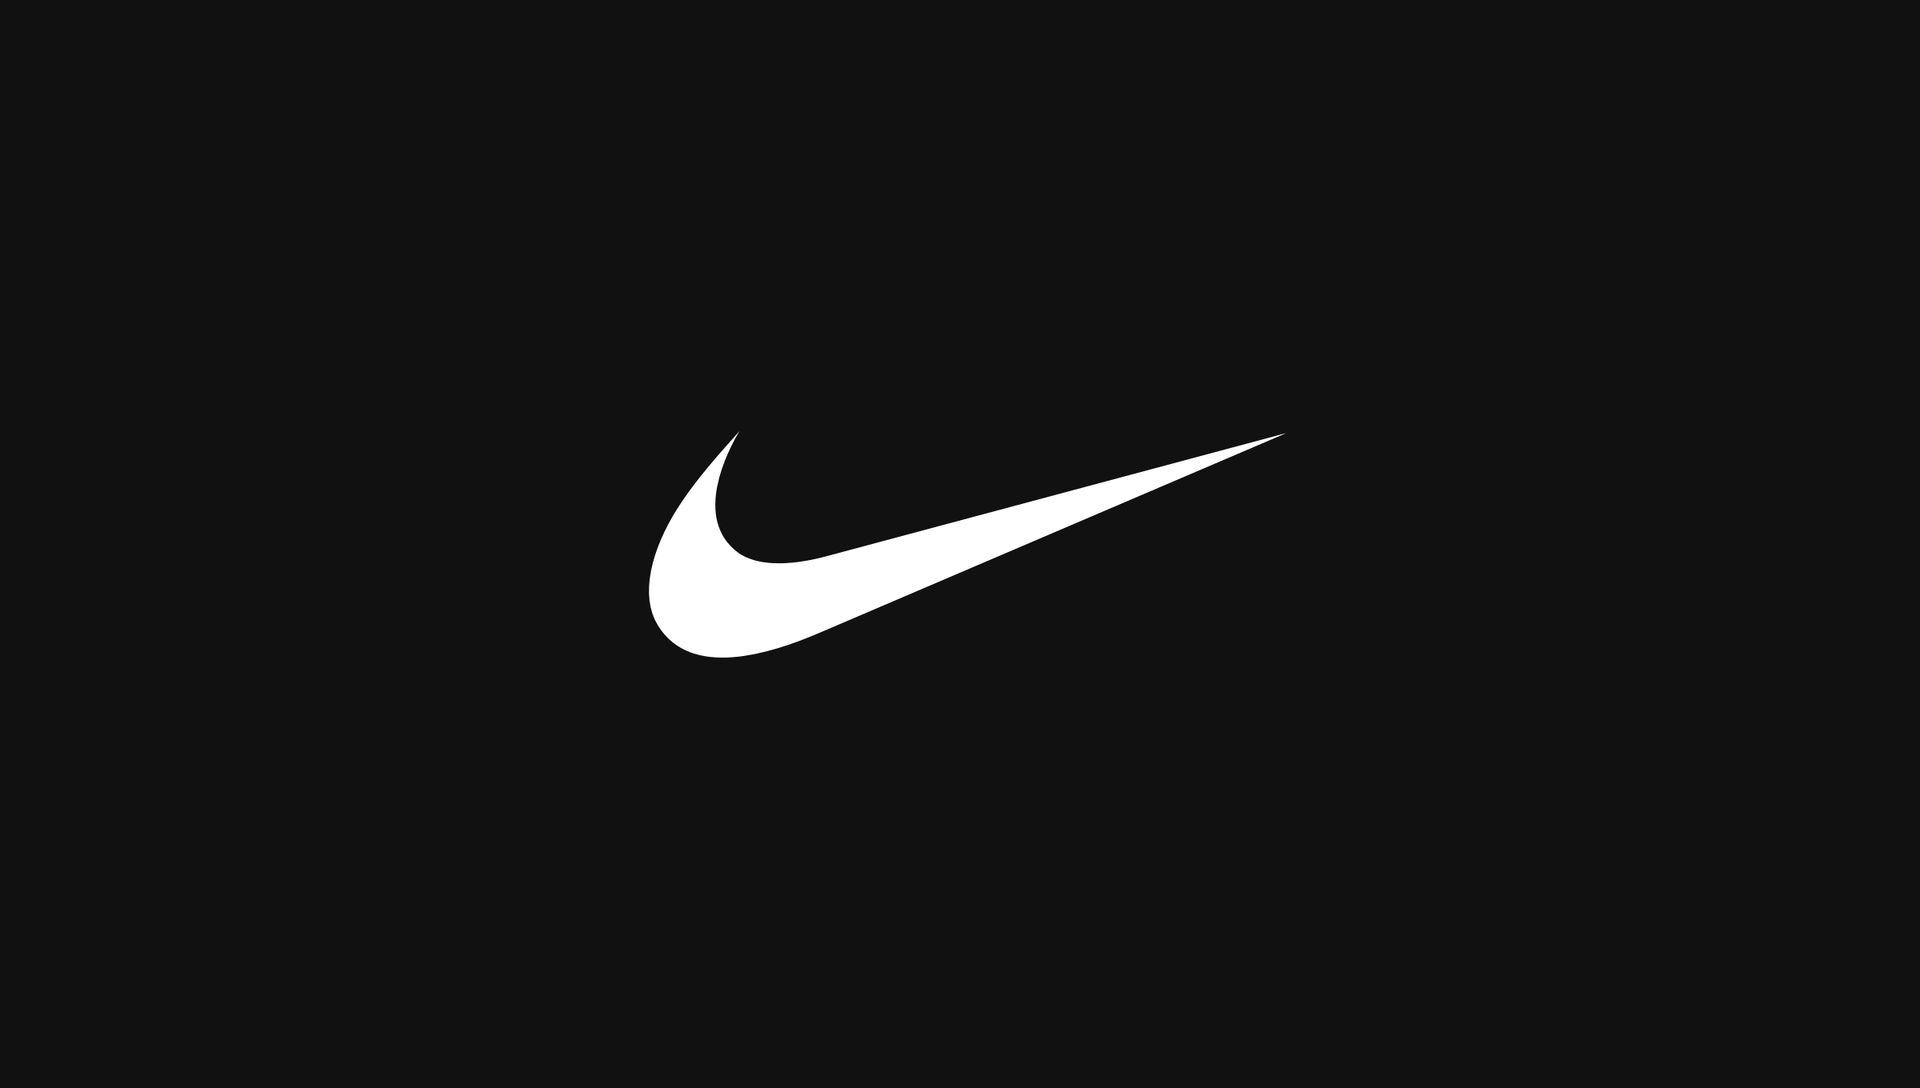 Nike logo. || Image Source: https://www.nike.com/in/